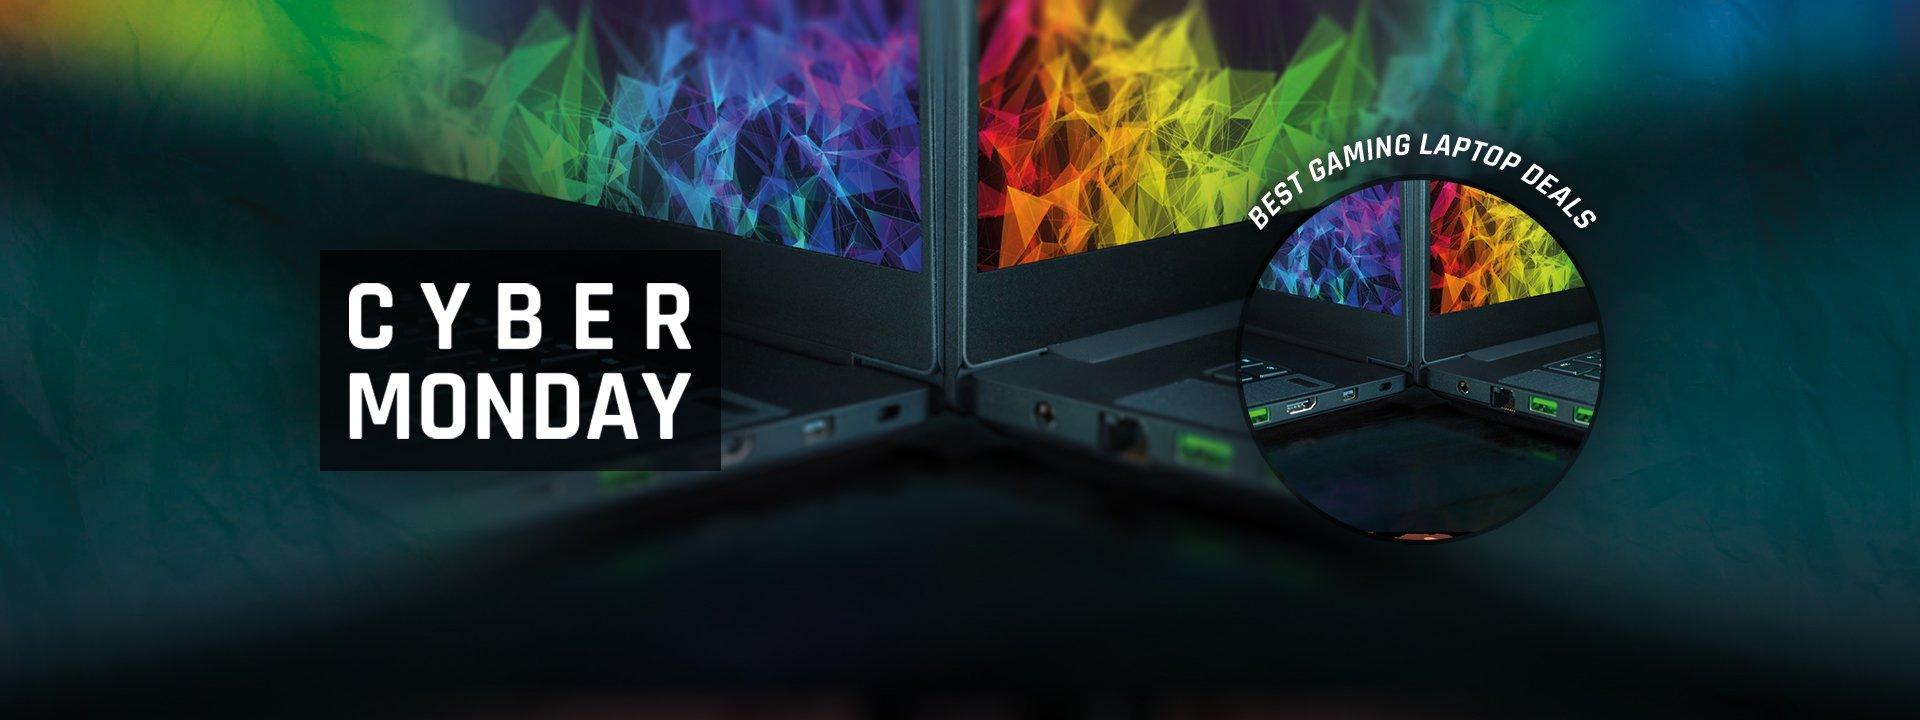 1558e5c67fb Best Cyber Monday 2018 gaming laptop deals | Shacknews